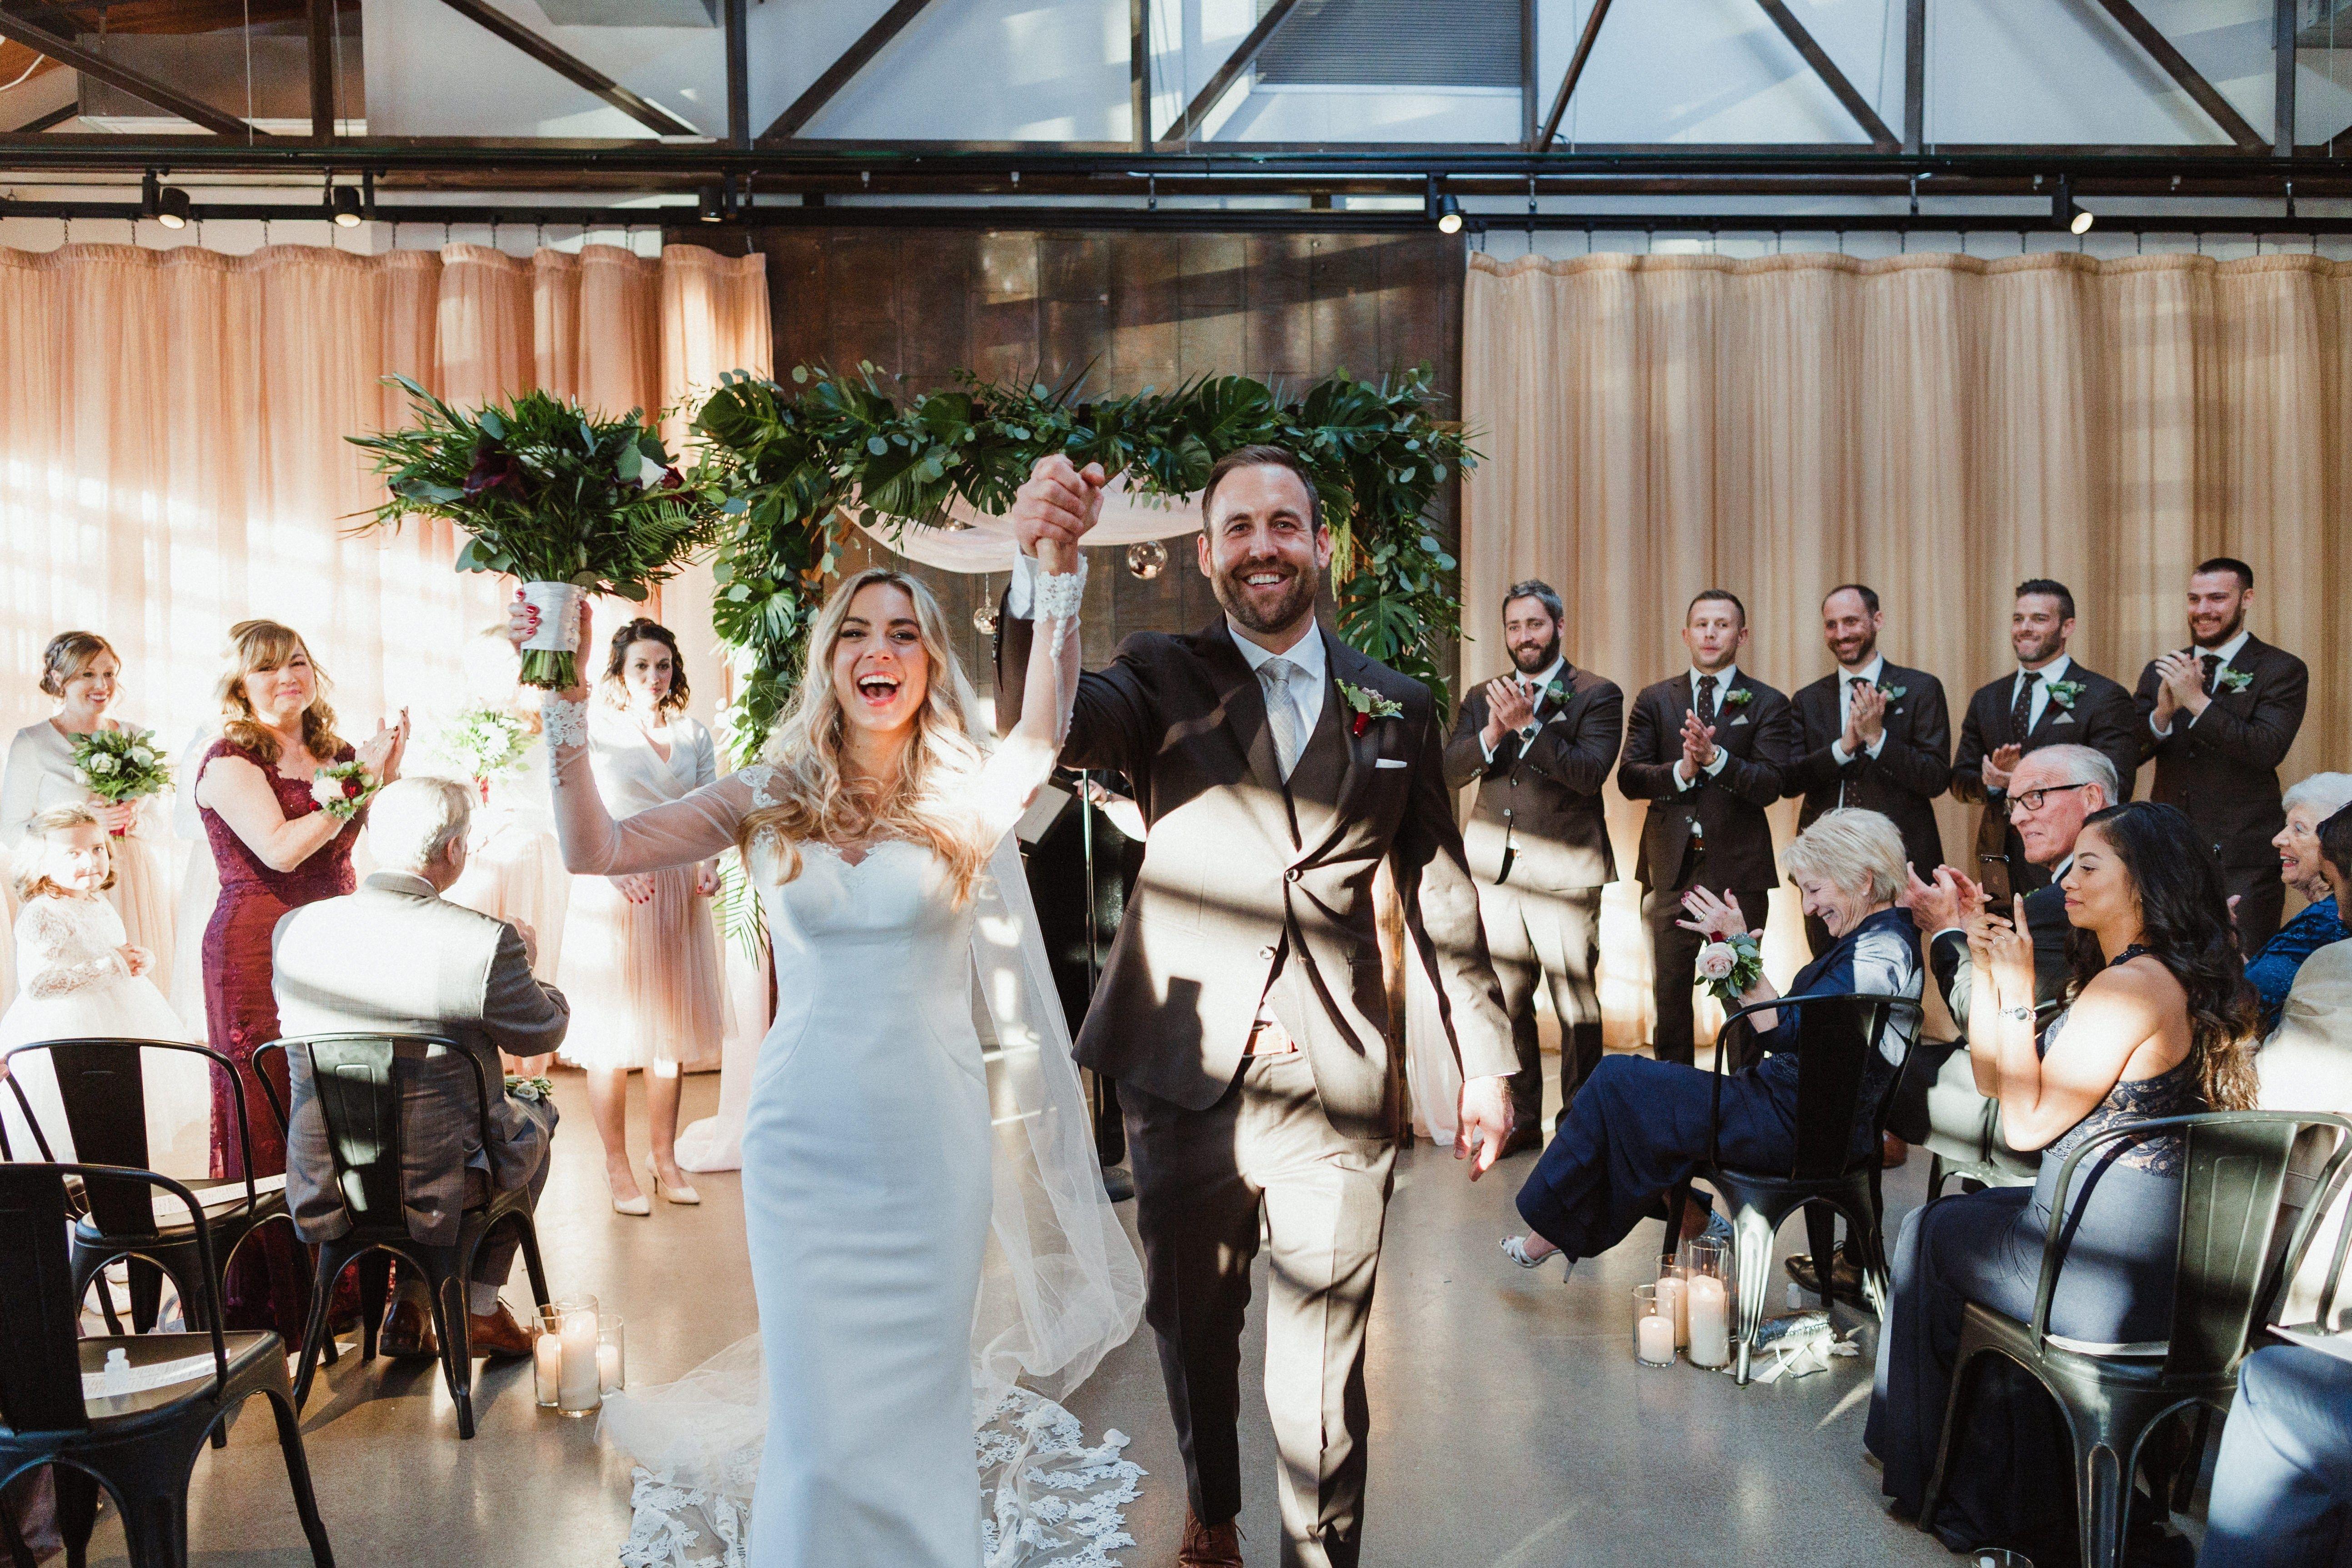 Industrial Boho Bridal Session Company 251 Aurora Il Boho Bridal Bridal Session Illinois Wedding Venues